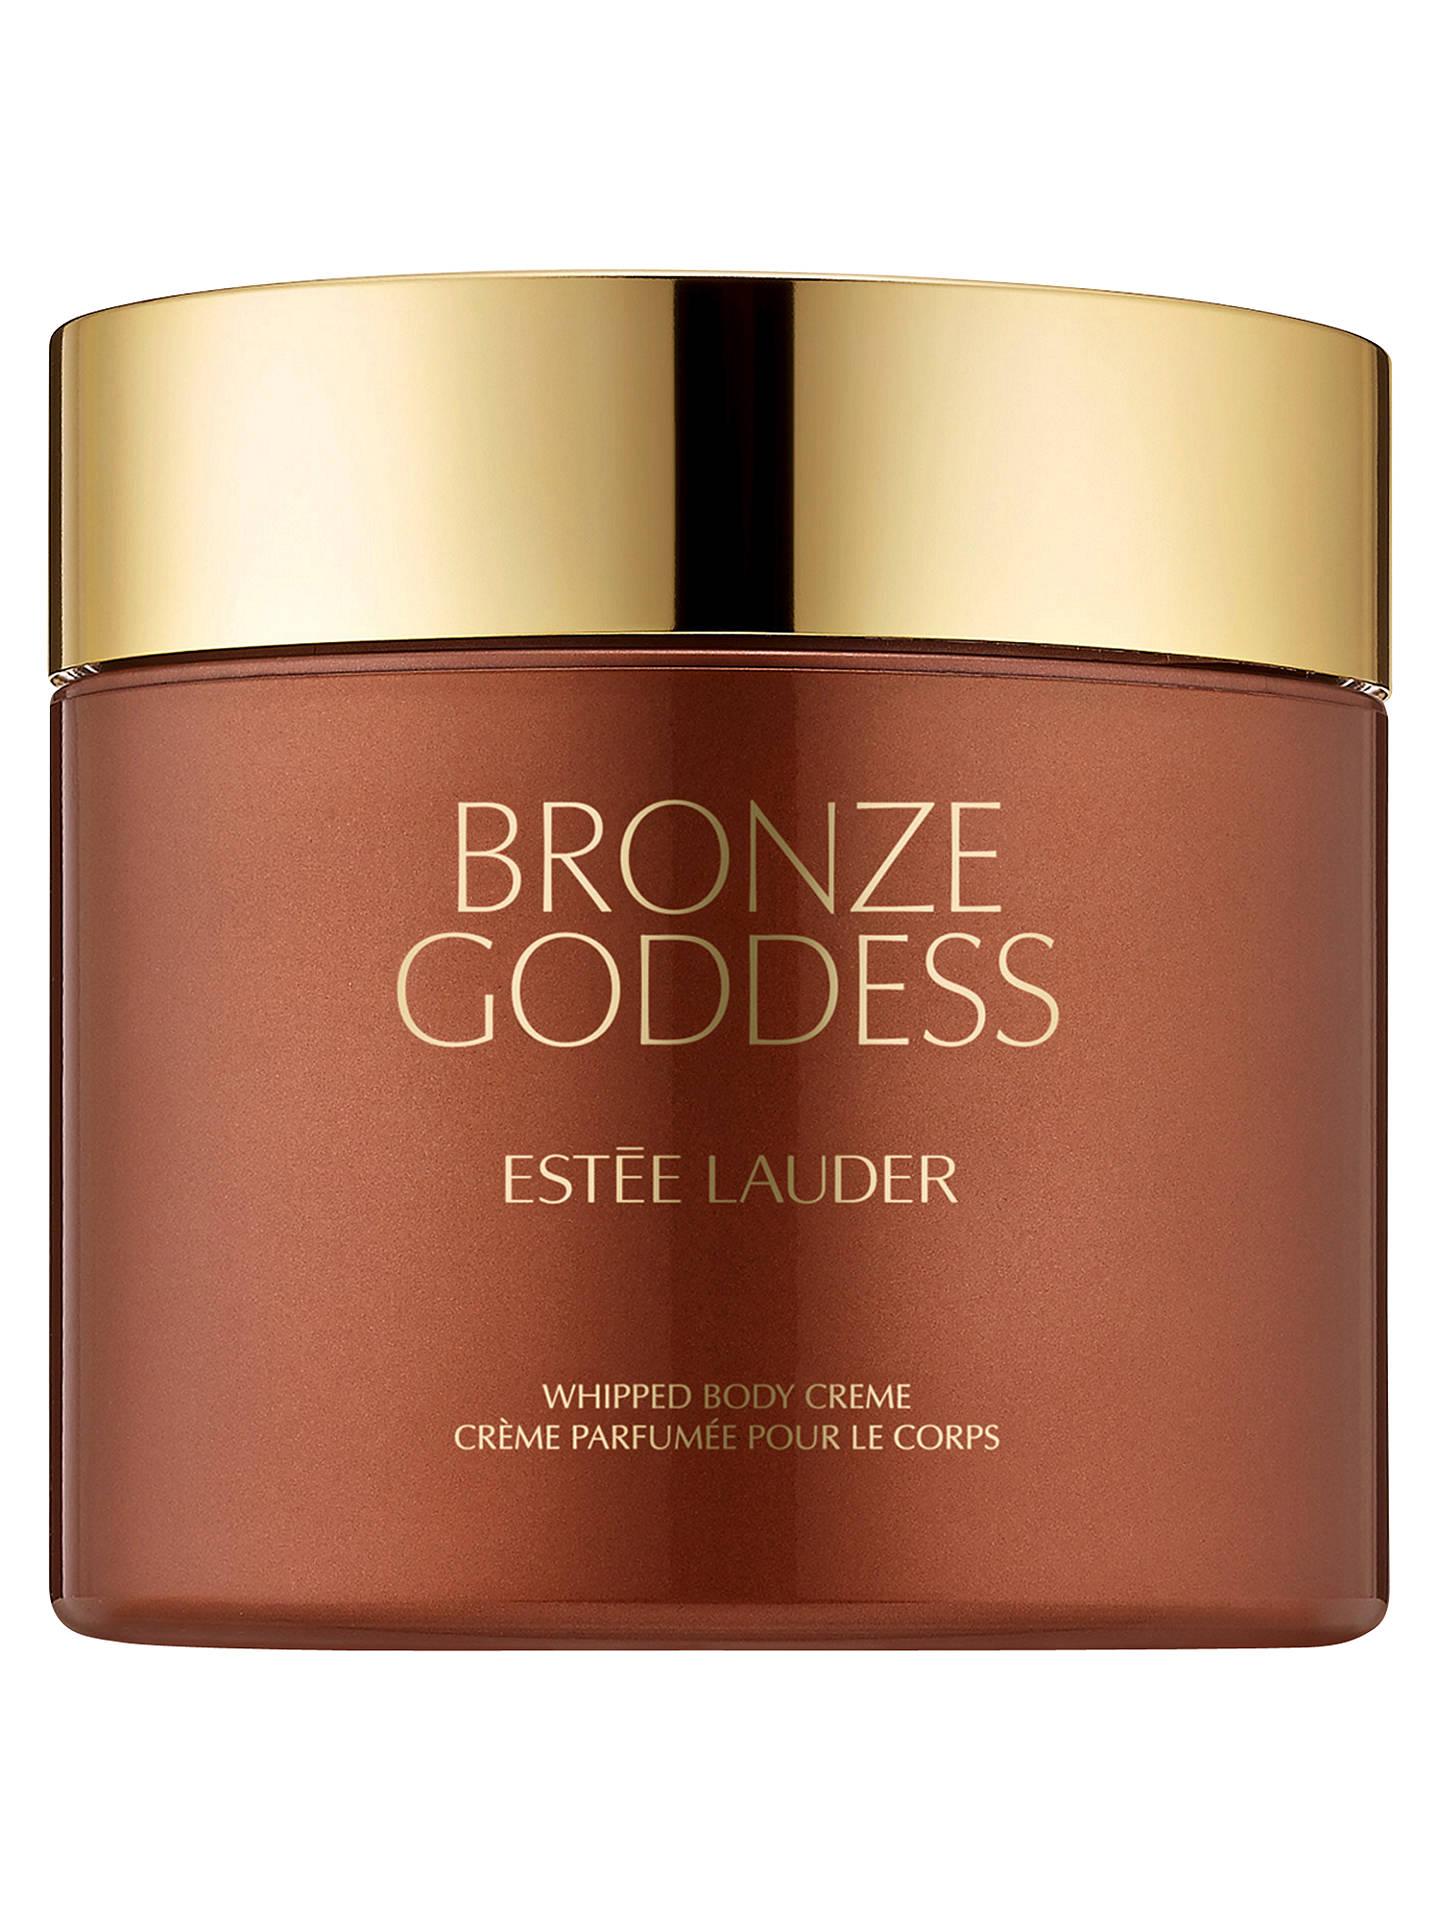 Estée Lauder Bronze Goddess Whipped Body Creme 200ml At John Lewis Partners